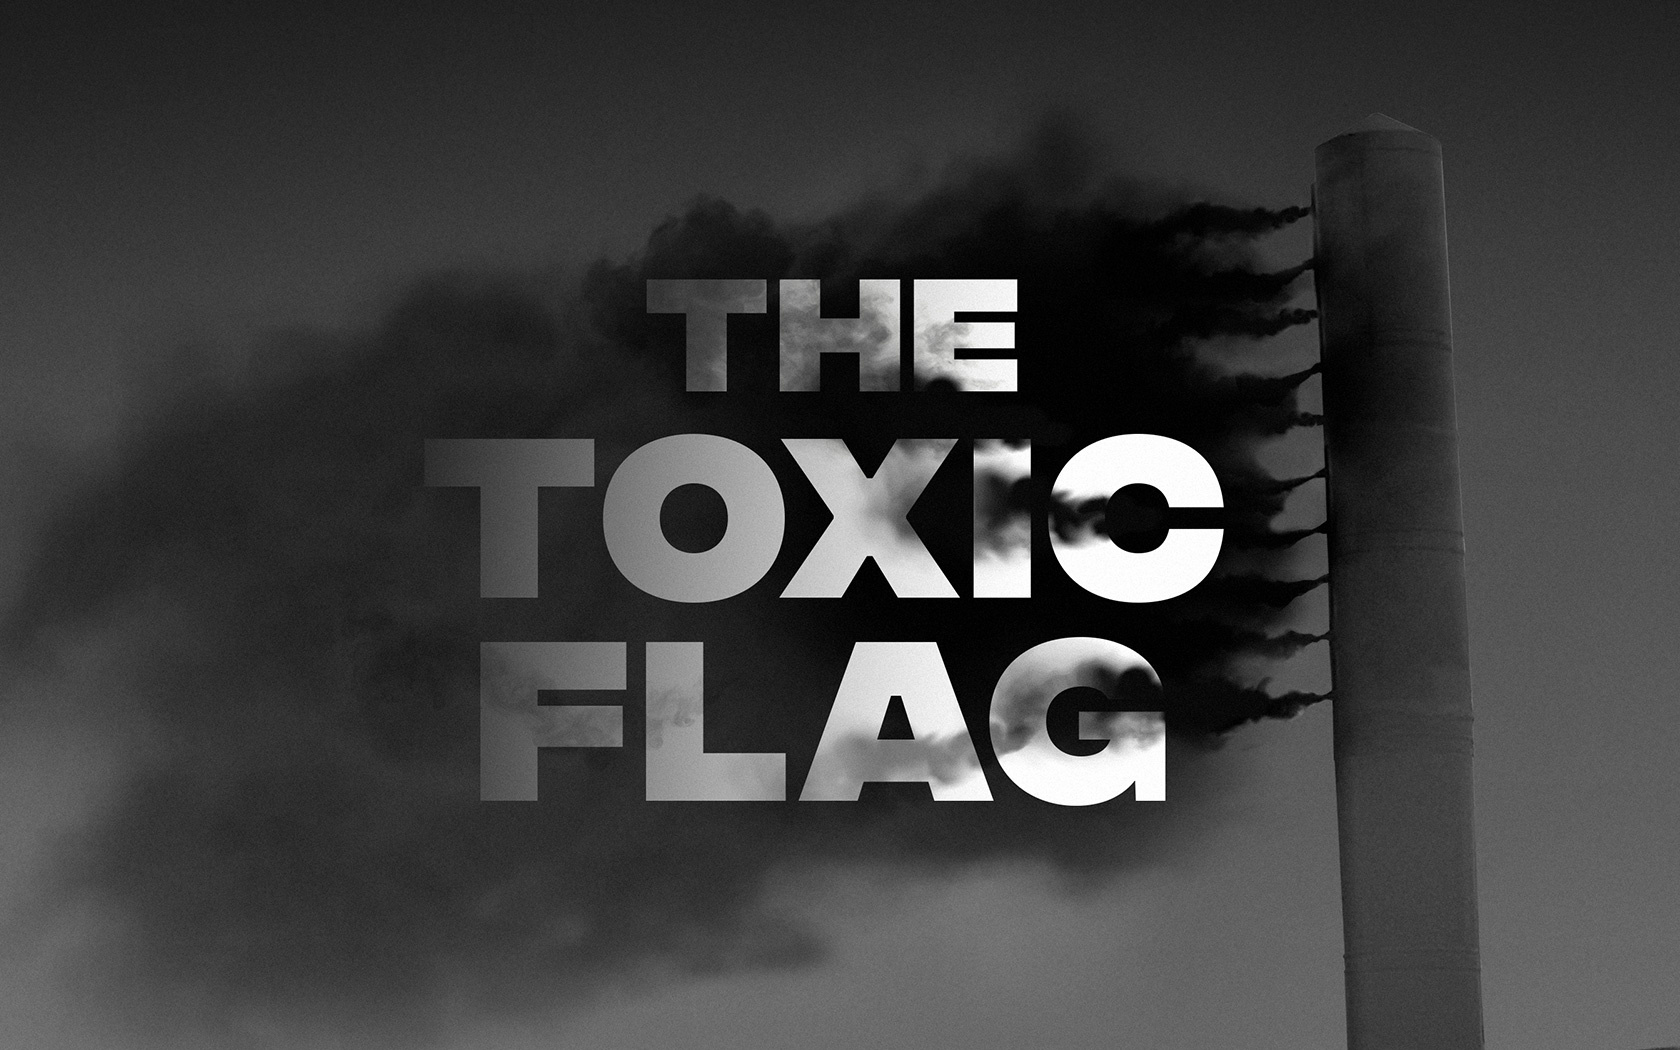 Thumbnail for Toxic Flag